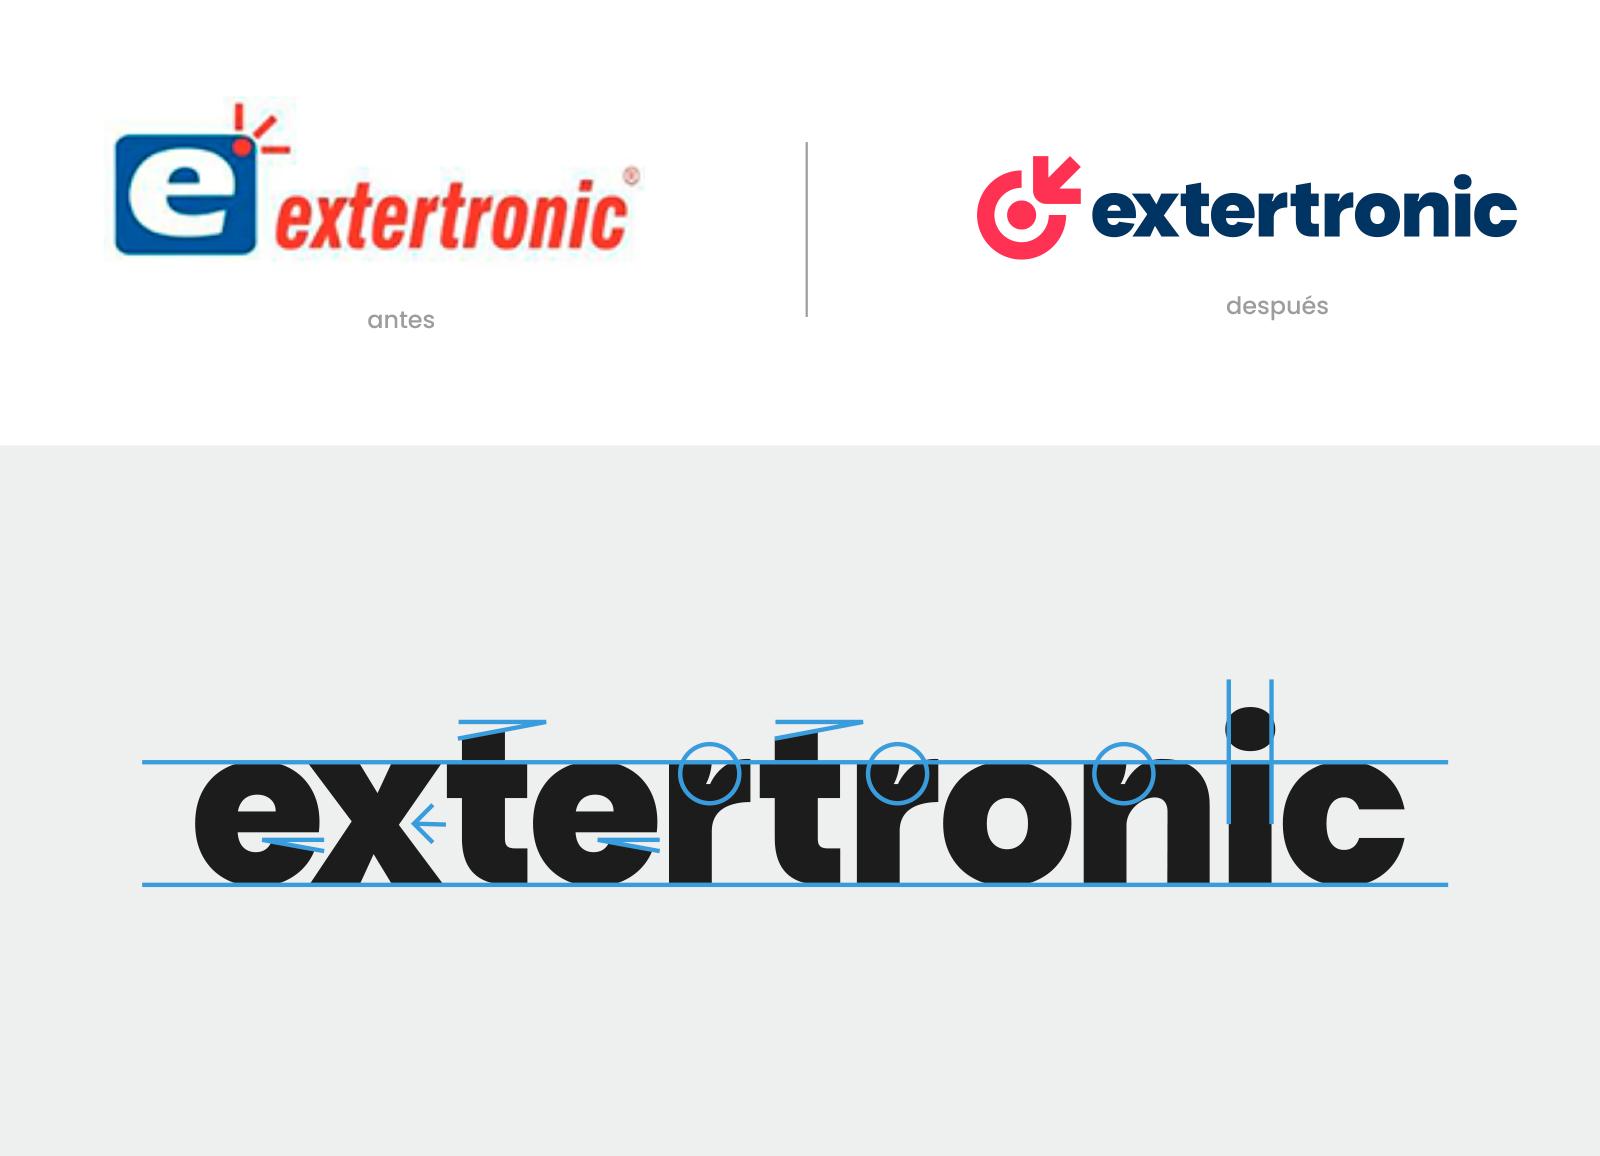 Extertronic, Identidad visual, logotipo